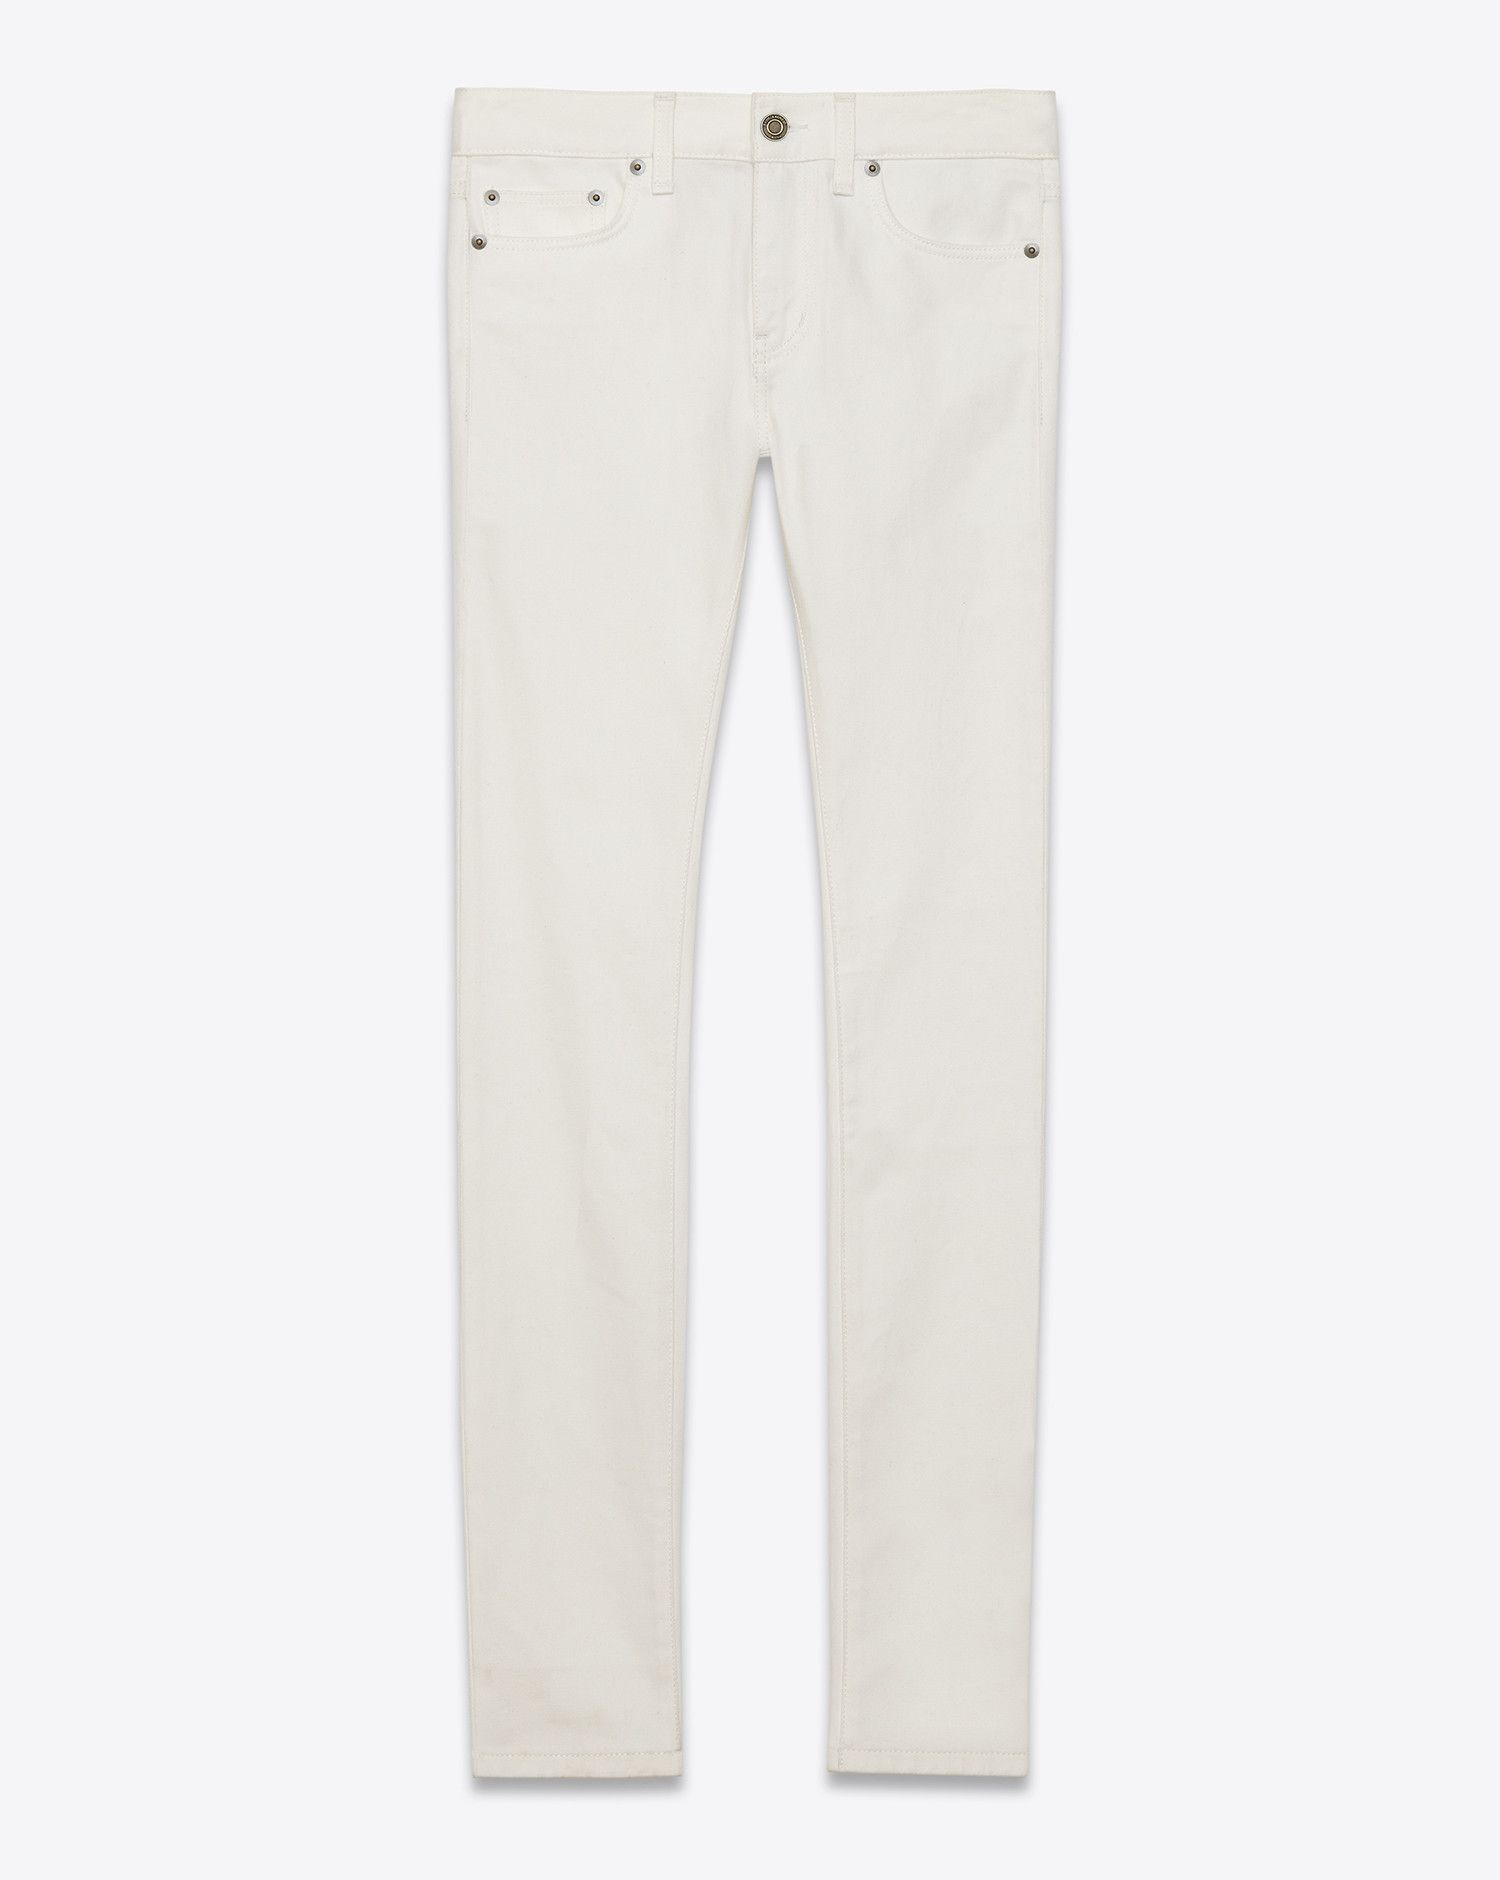 dce6cd7f9b9 Saint Laurent, ORIGINAL LOW WAISTED SKINNY JEAN (White) | Pants ...